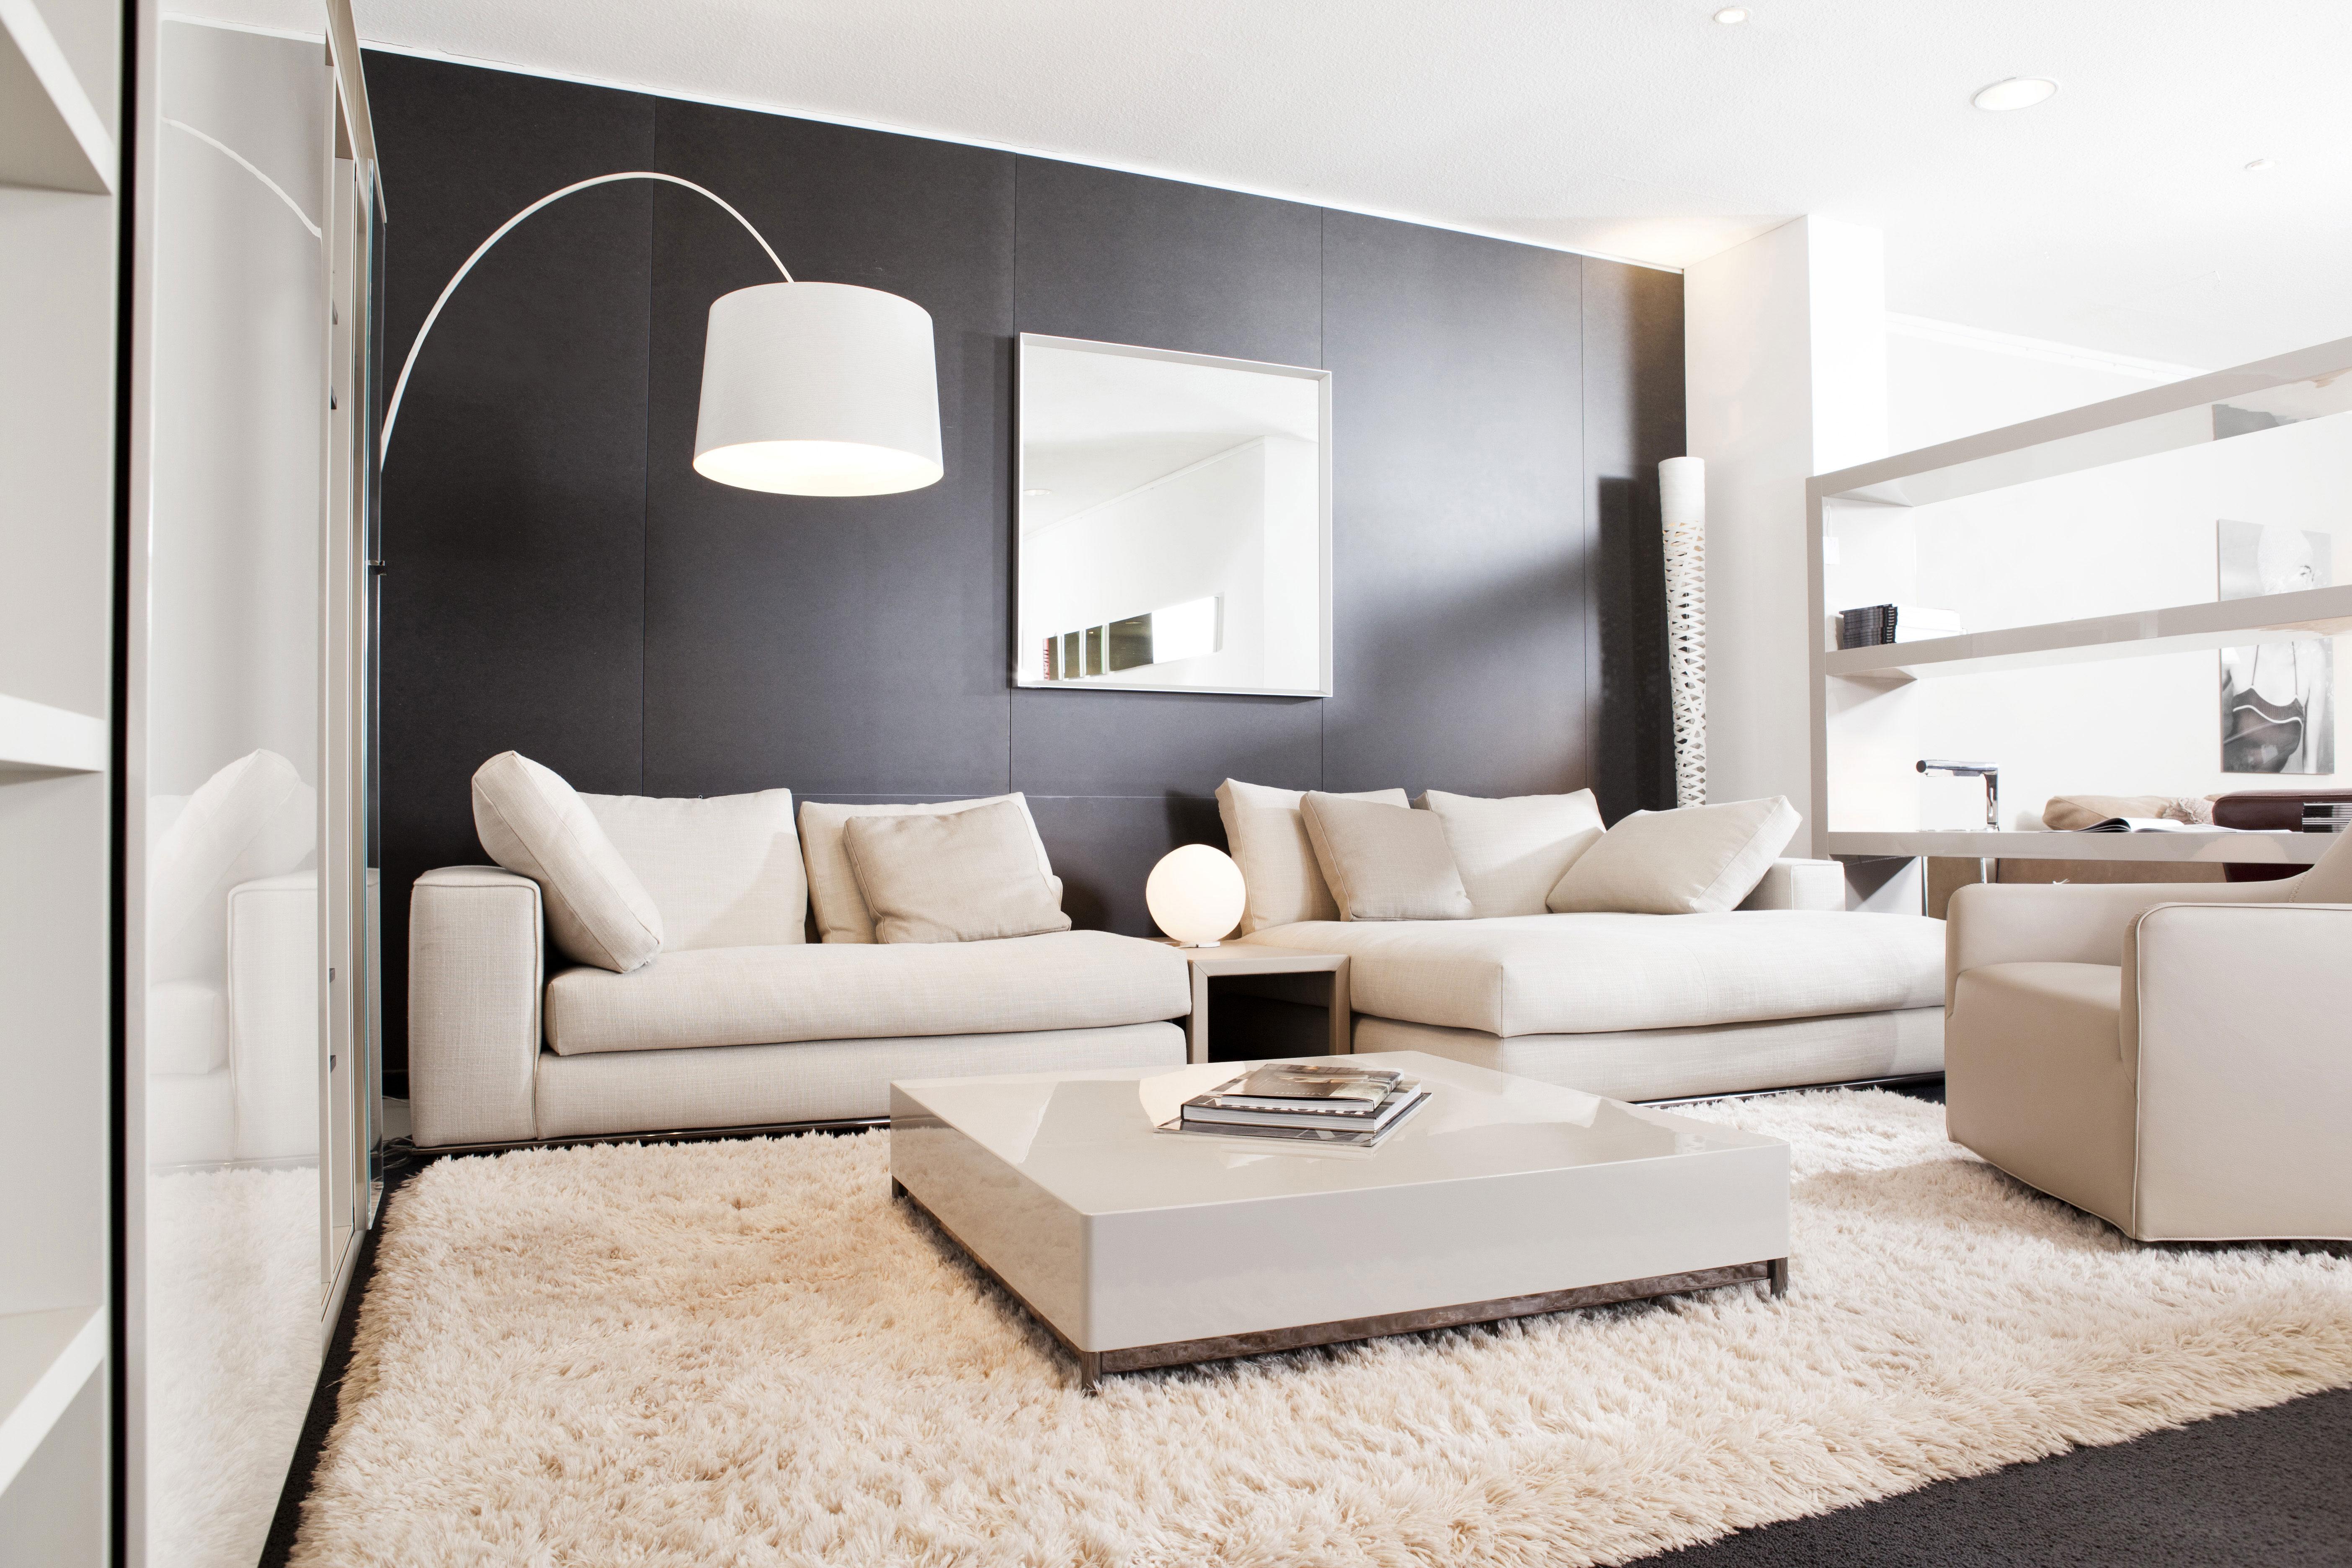 topditop stores. Black Bedroom Furniture Sets. Home Design Ideas